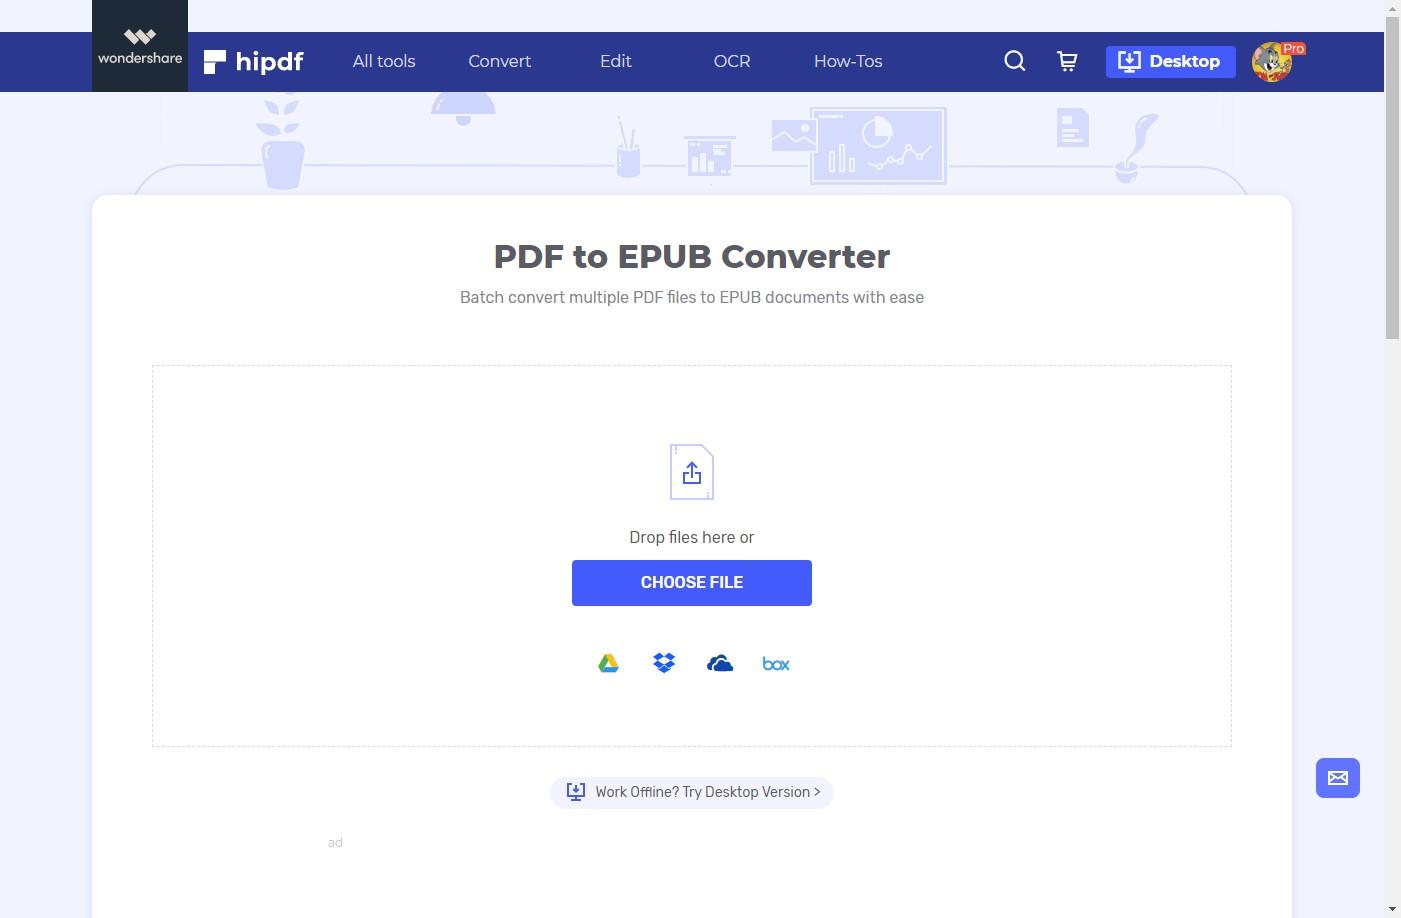 hipdf pdf to epub converter